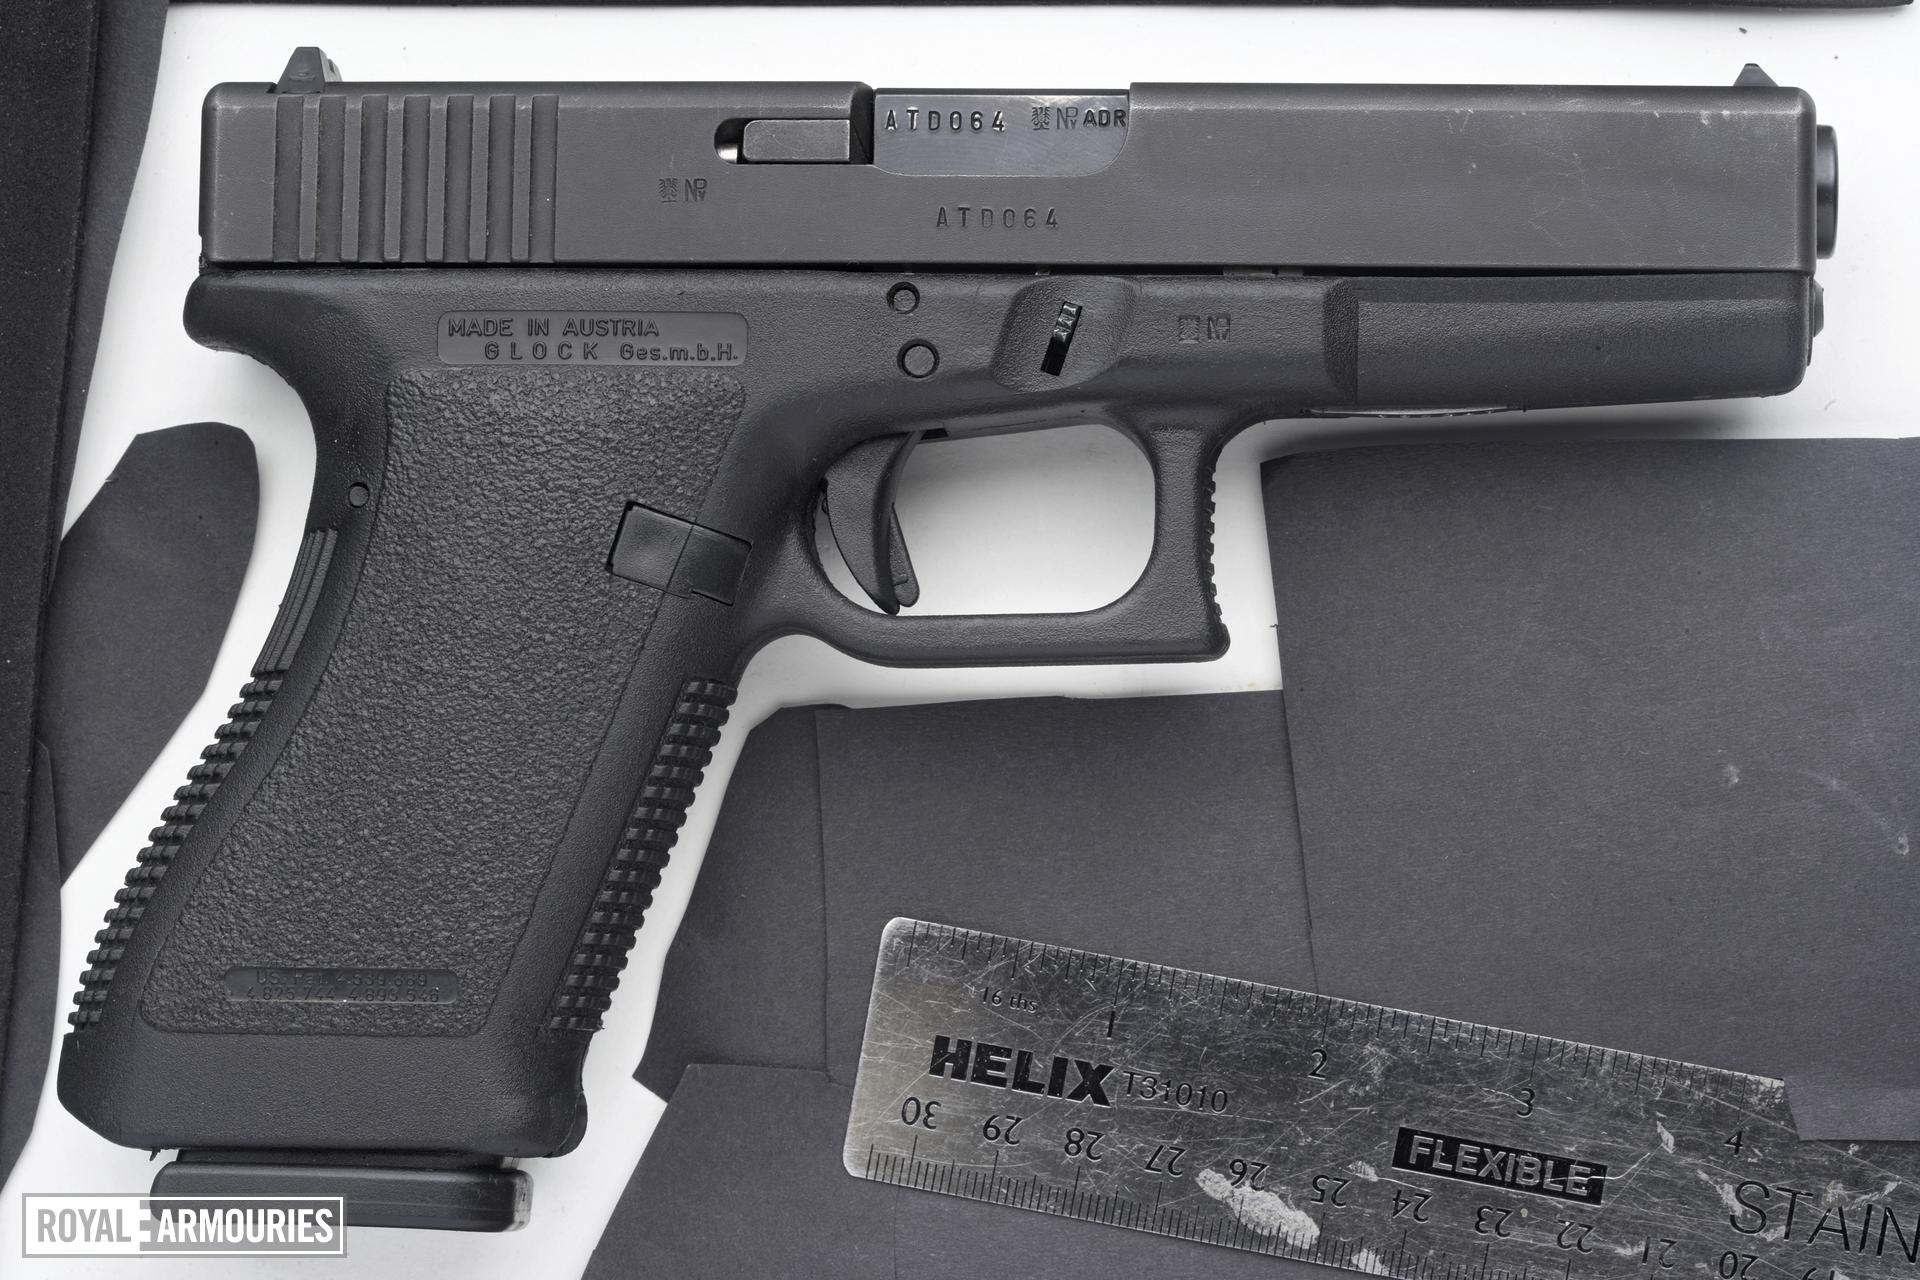 Centrefire self-loading pistol - Glock 21